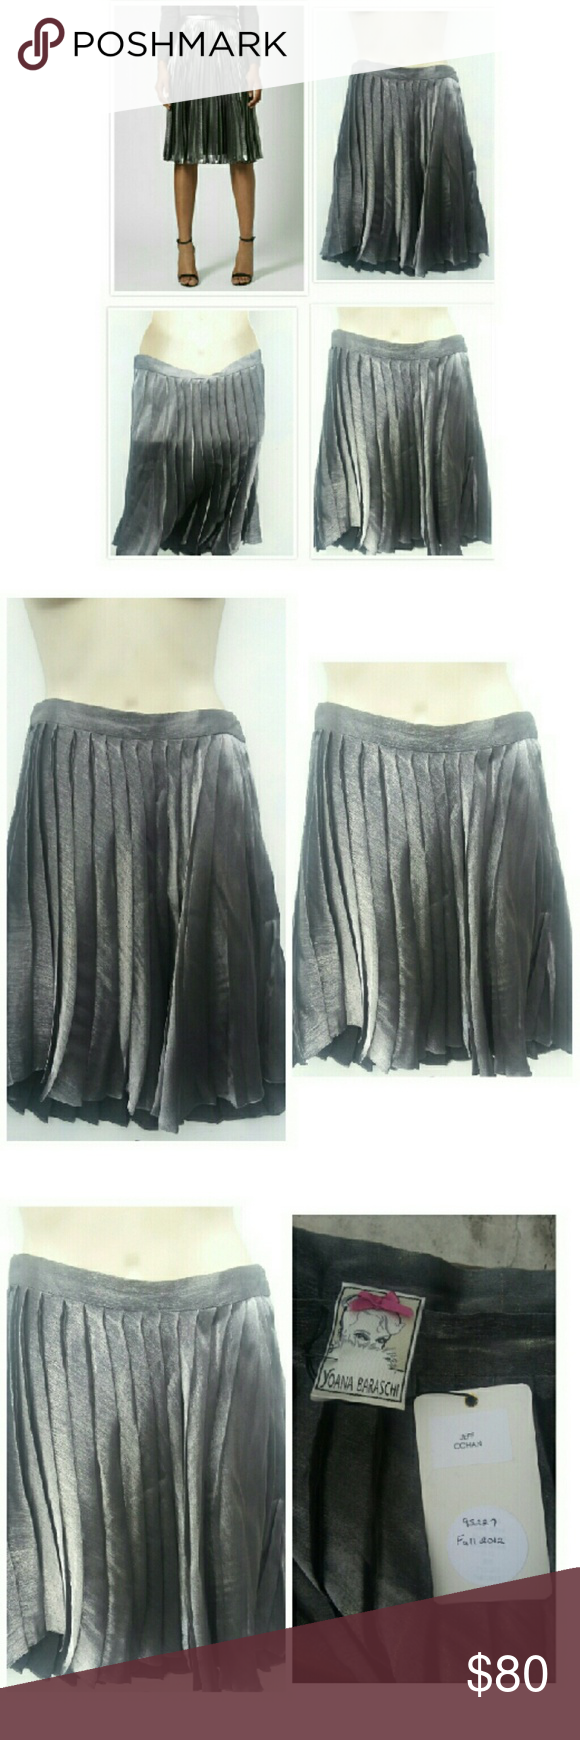 7008c17e47 ANTHRO WAVE METALLIC PLEATED SKIRT SZ S Yoana Baraschi brought at  ANTHROPOLOGIE NYC Gorgeous grey metallic pleated skirt size small 25% off  Bundles of 2 ...